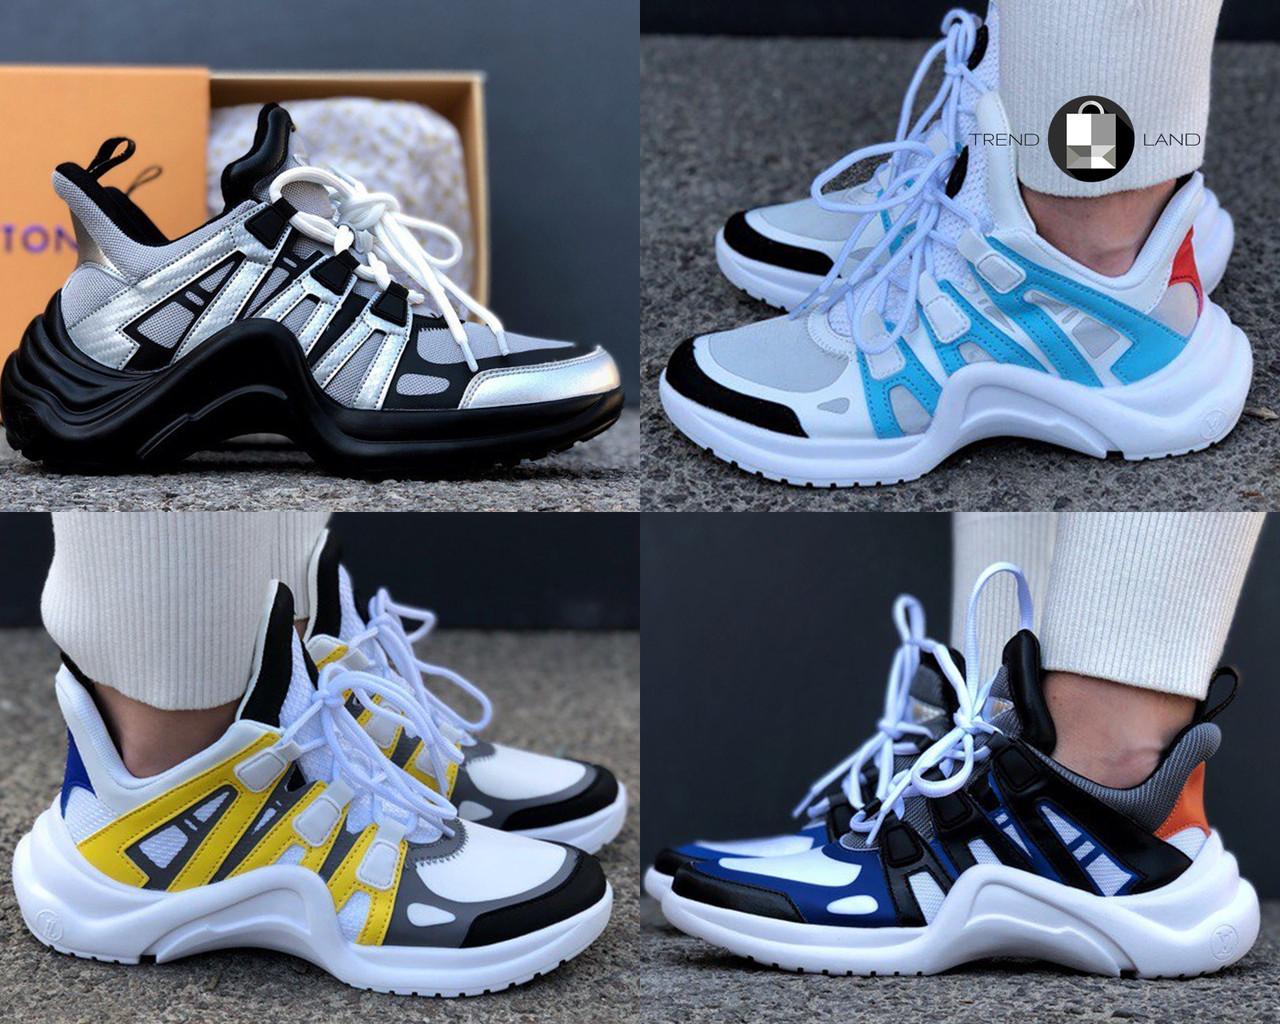 25b4d23583ec Женские кроссовки Louis Vuitton LV Archlight Sneaker 4 цвета (Реплика AAA+)  - Интернет-